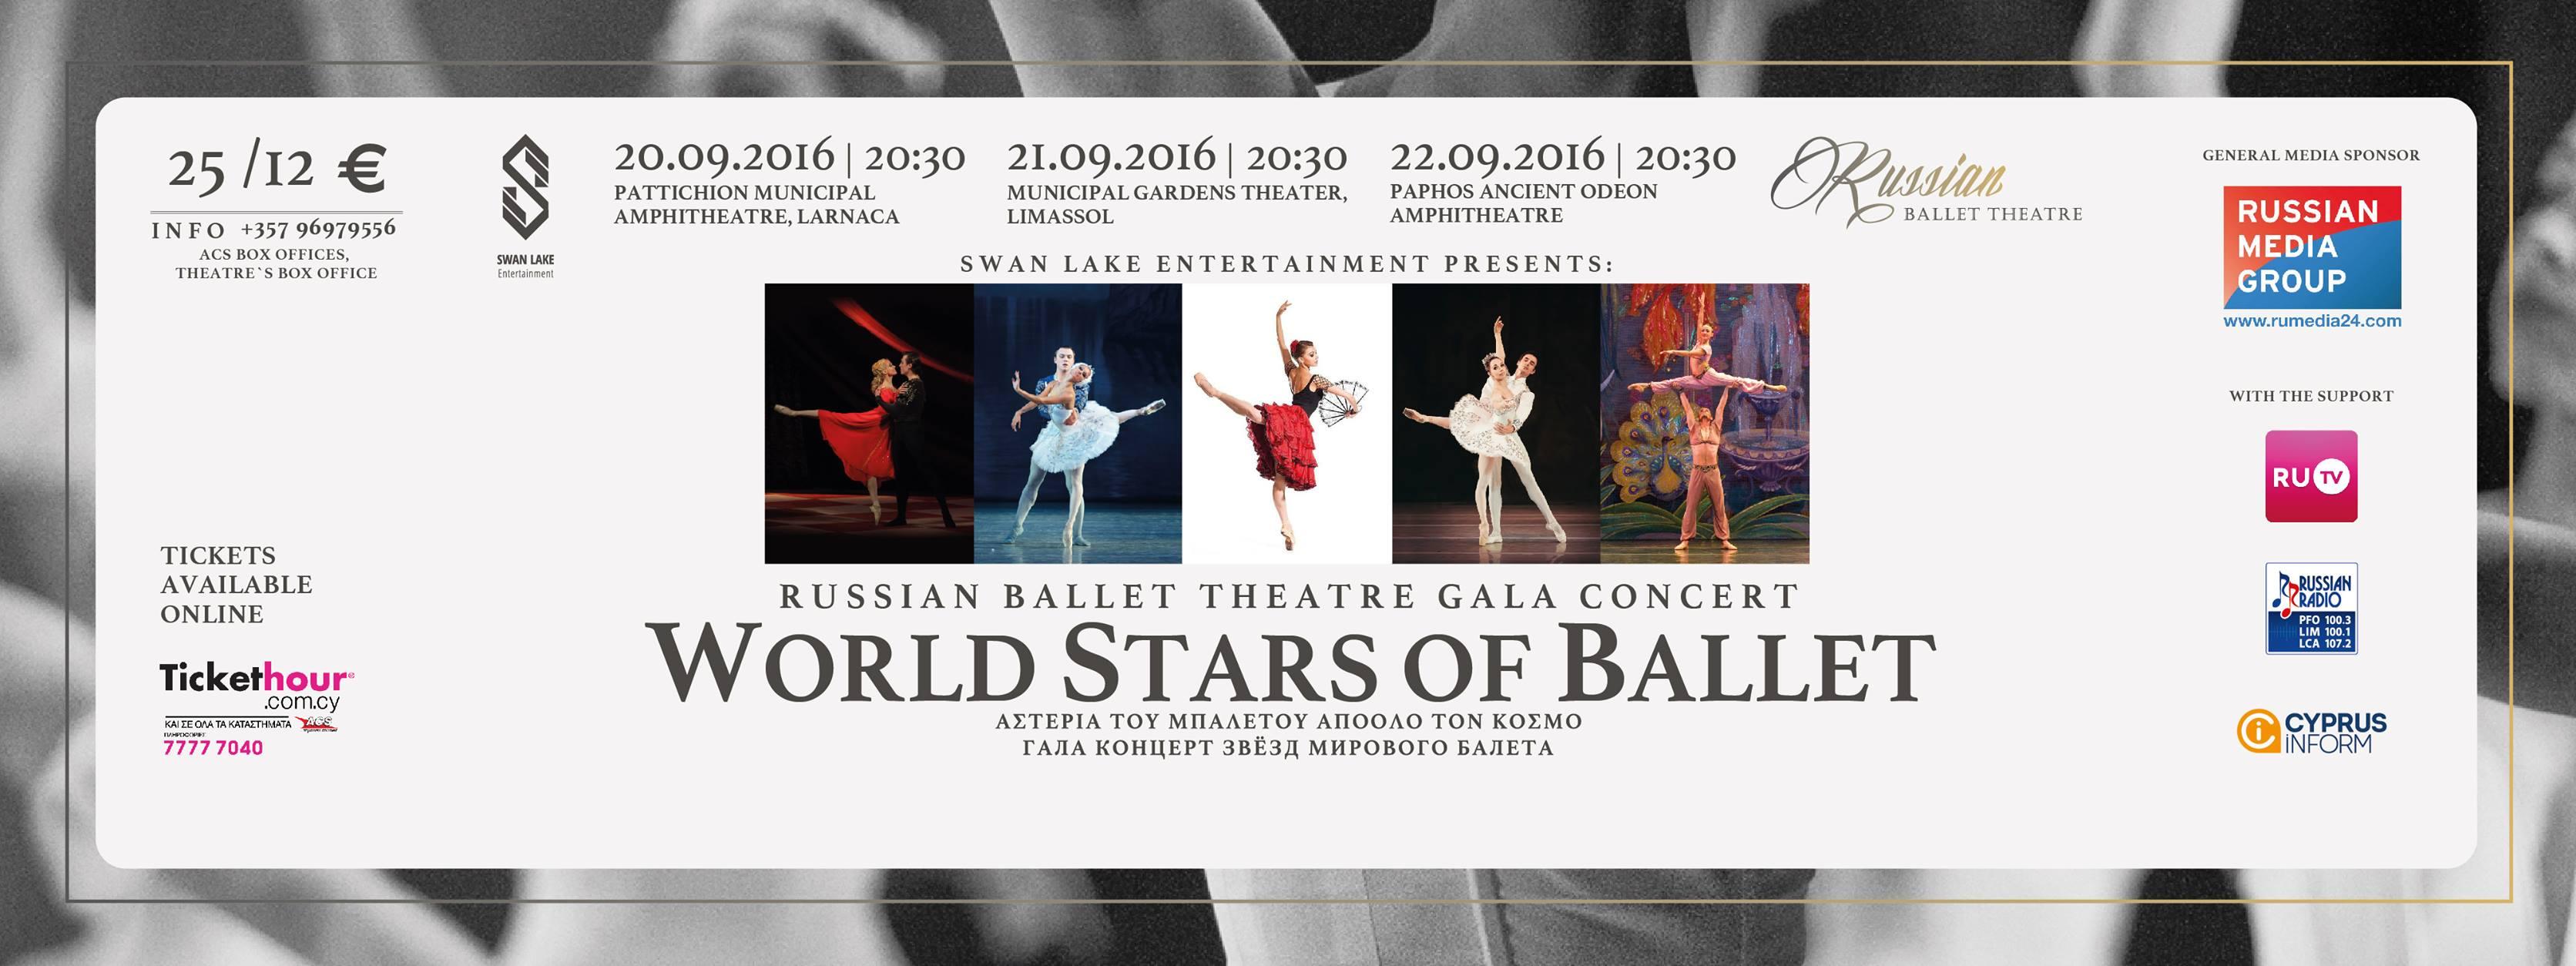 fc4cf7d928b World Stars of Ballet in Cyprus @ Δημοτικό Κηποθέατρο Λεμεσού